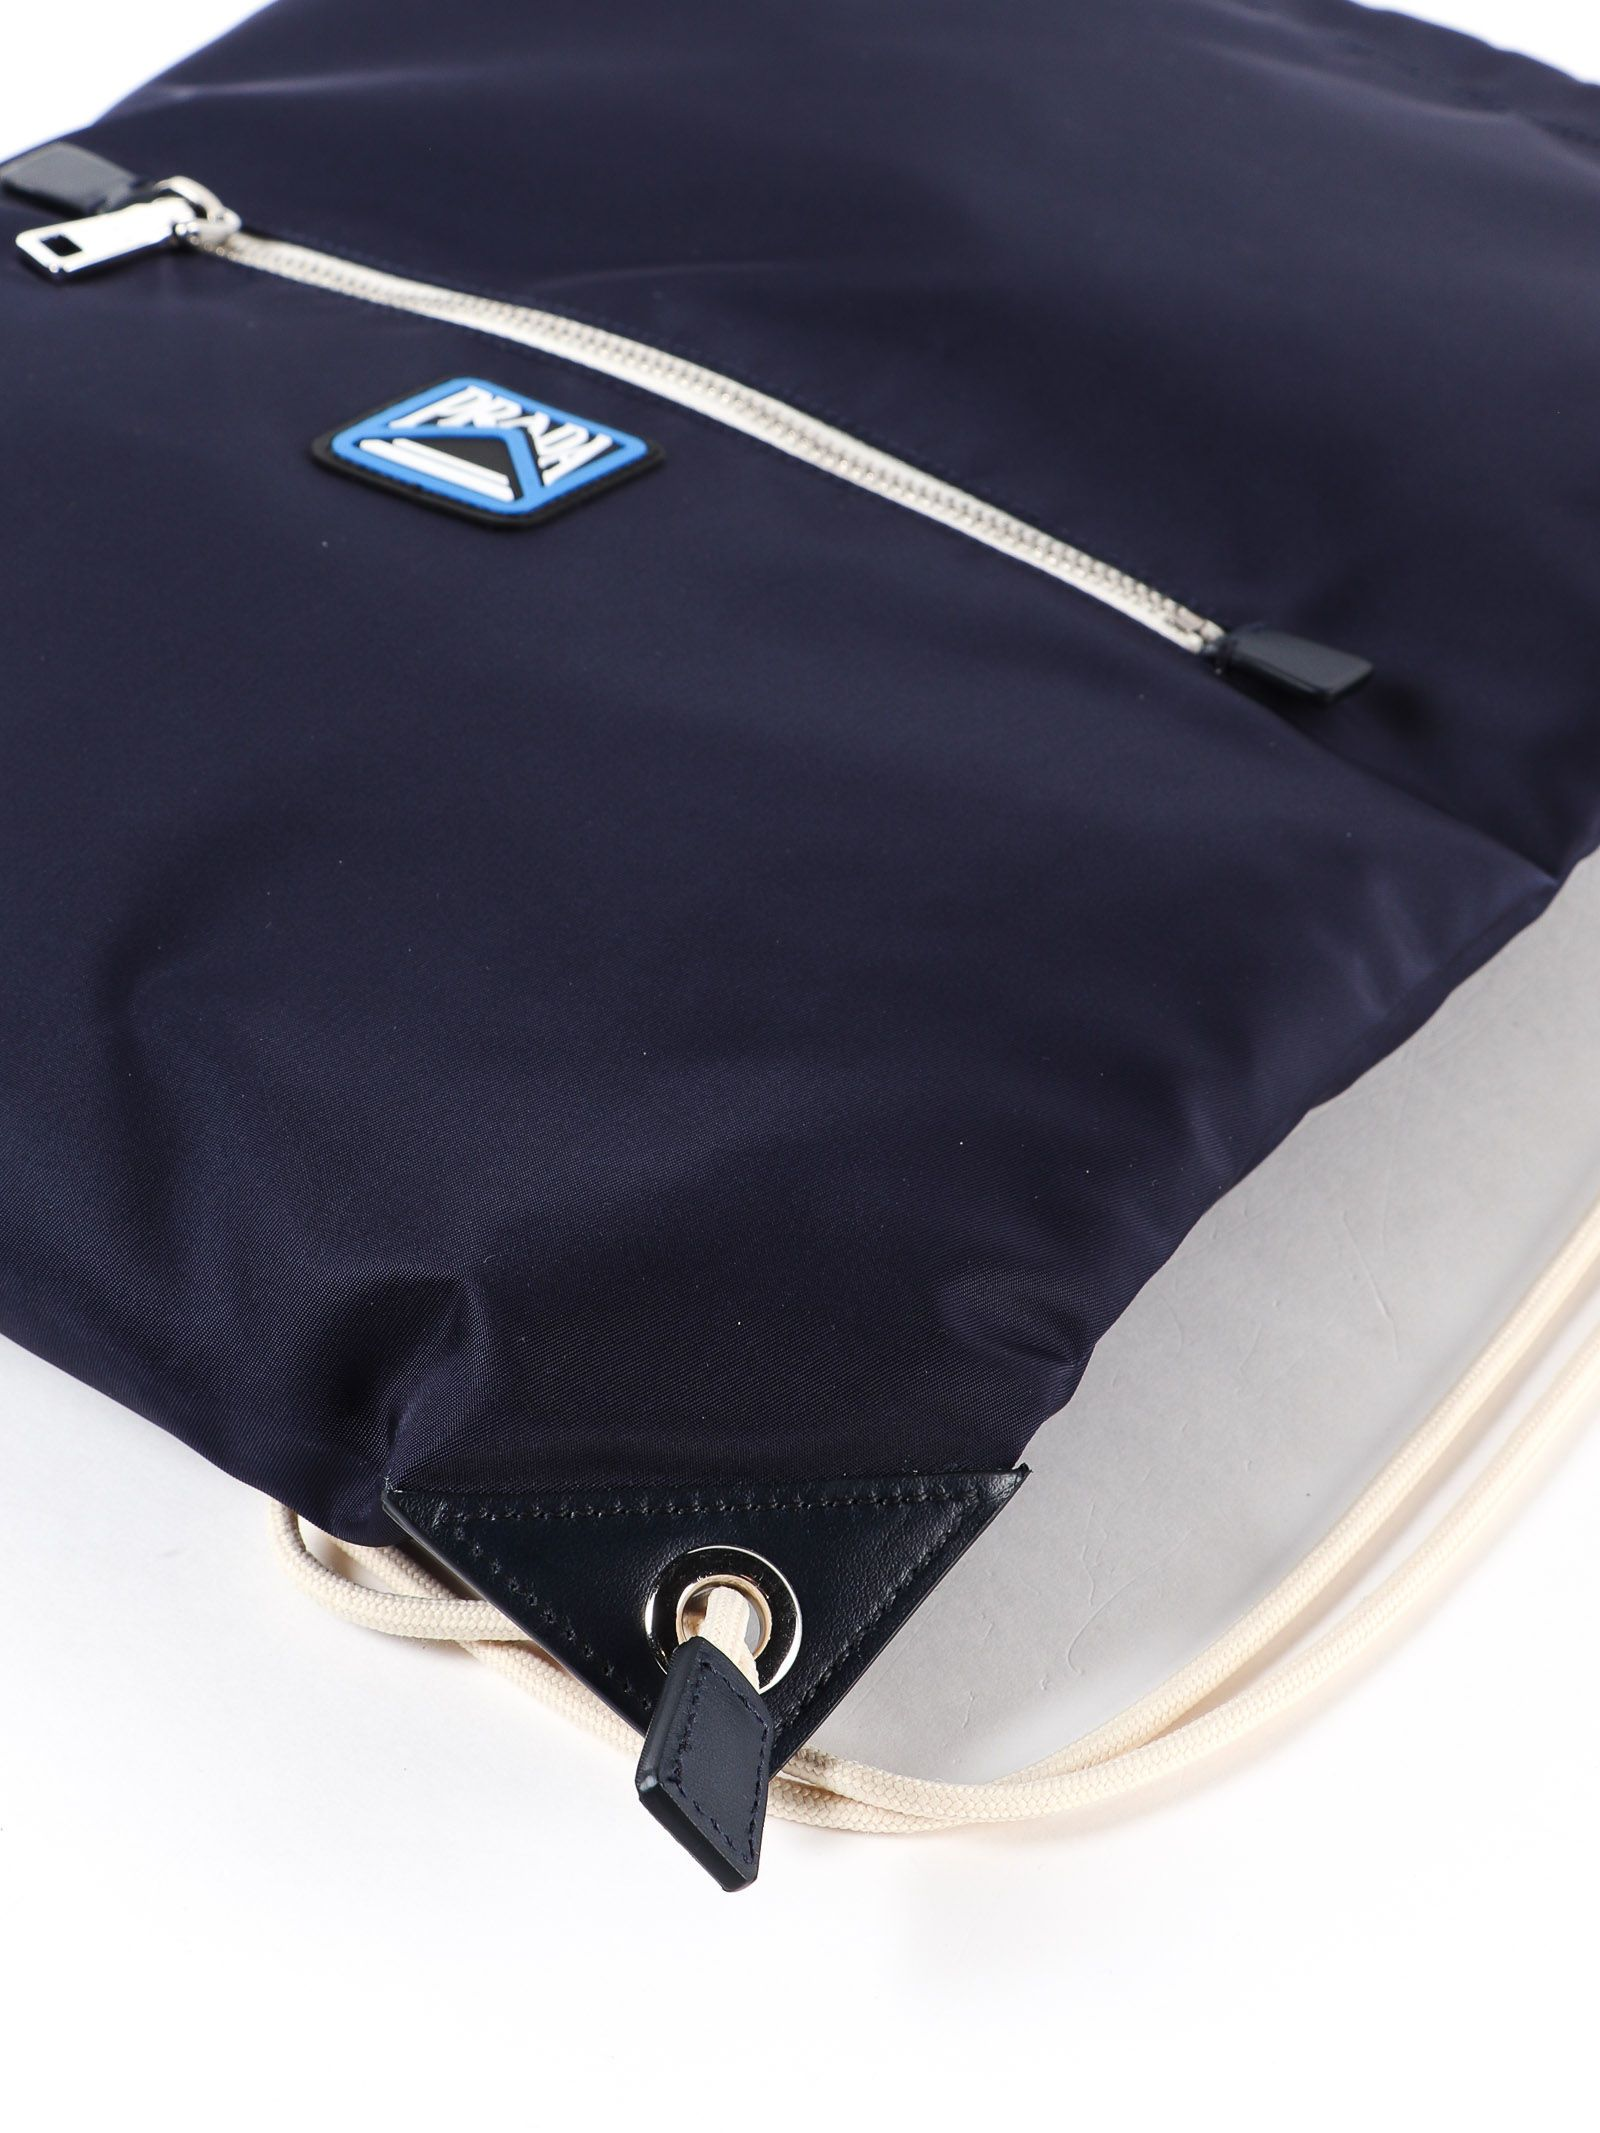 597126eea4d3 Prada Drawstring Backpack - Baltico Prada Drawstring Backpack - Baltico ...